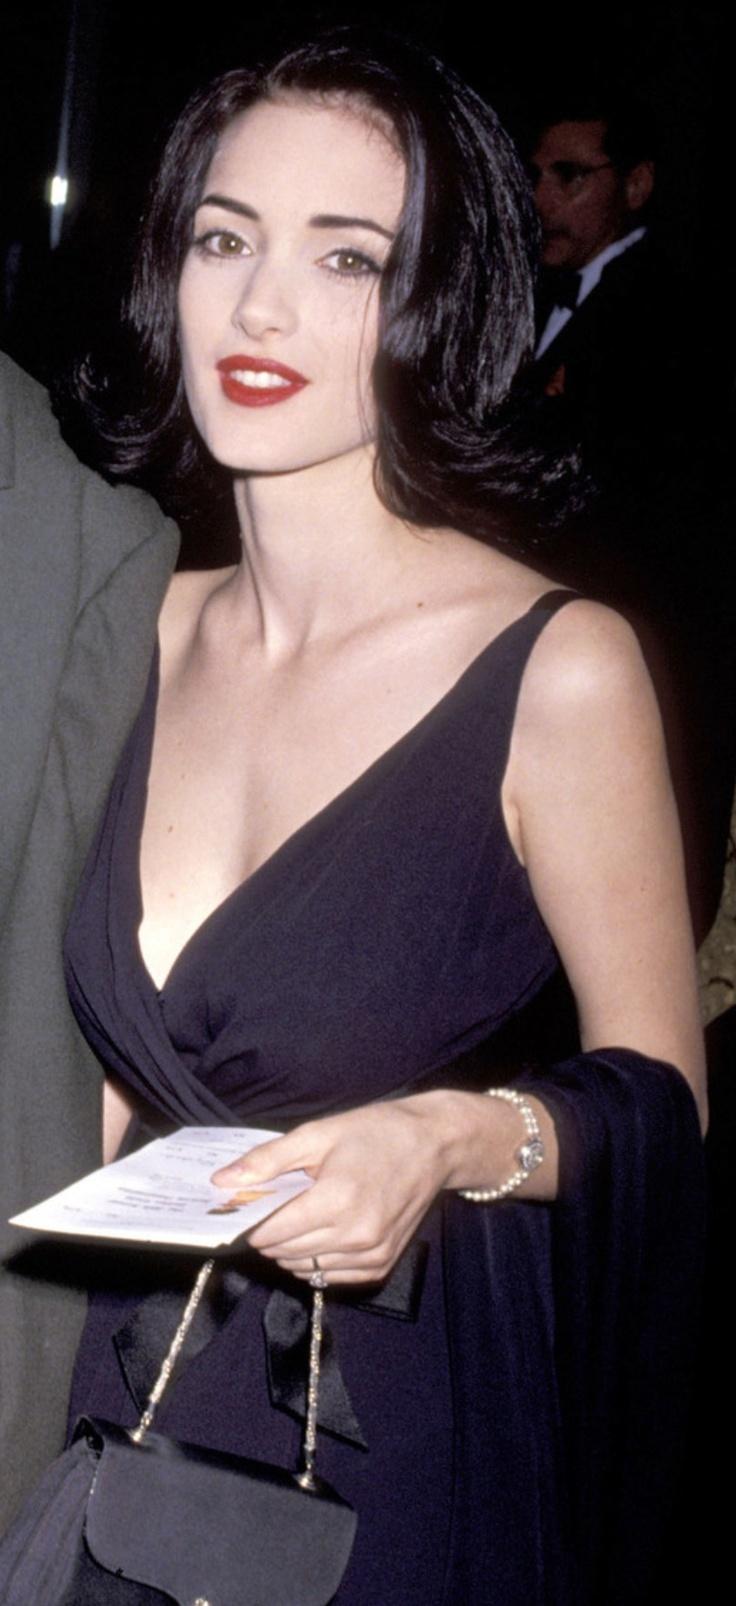 Winona Ryder 90s | Bea...